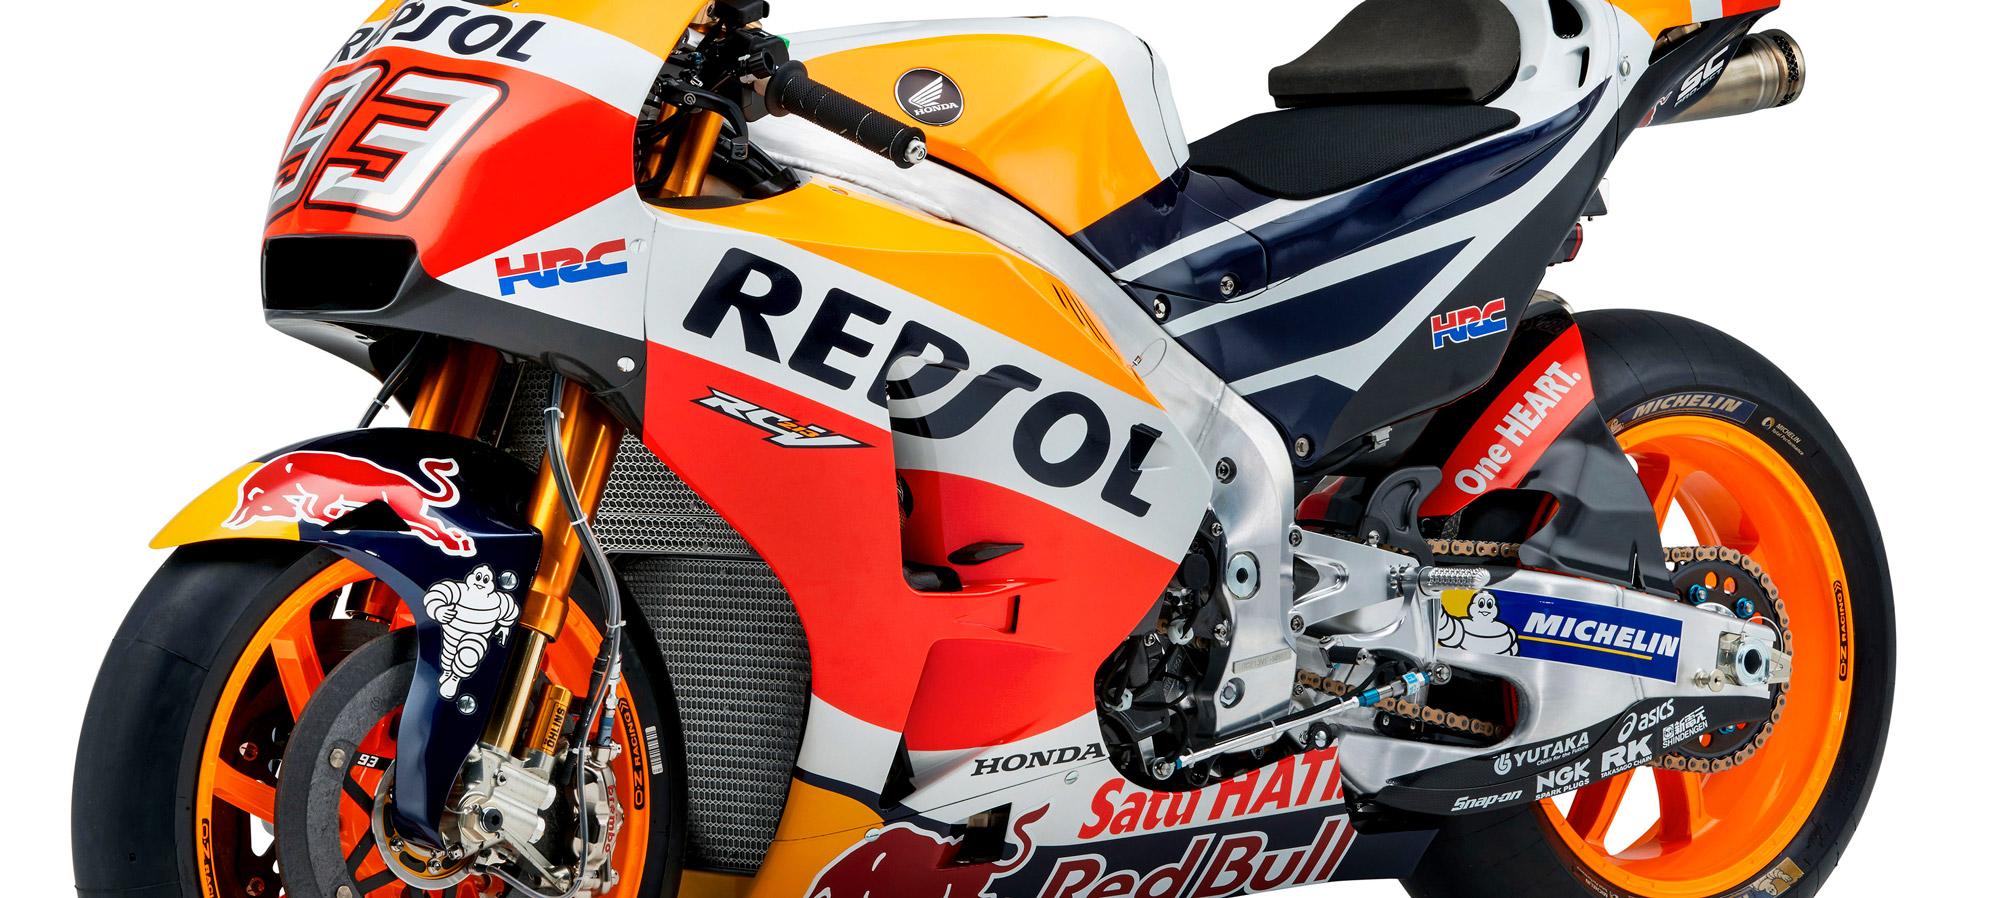 RTRSports – Sponsorship: PSP Global Service and Honda HRC MotoGP 2017